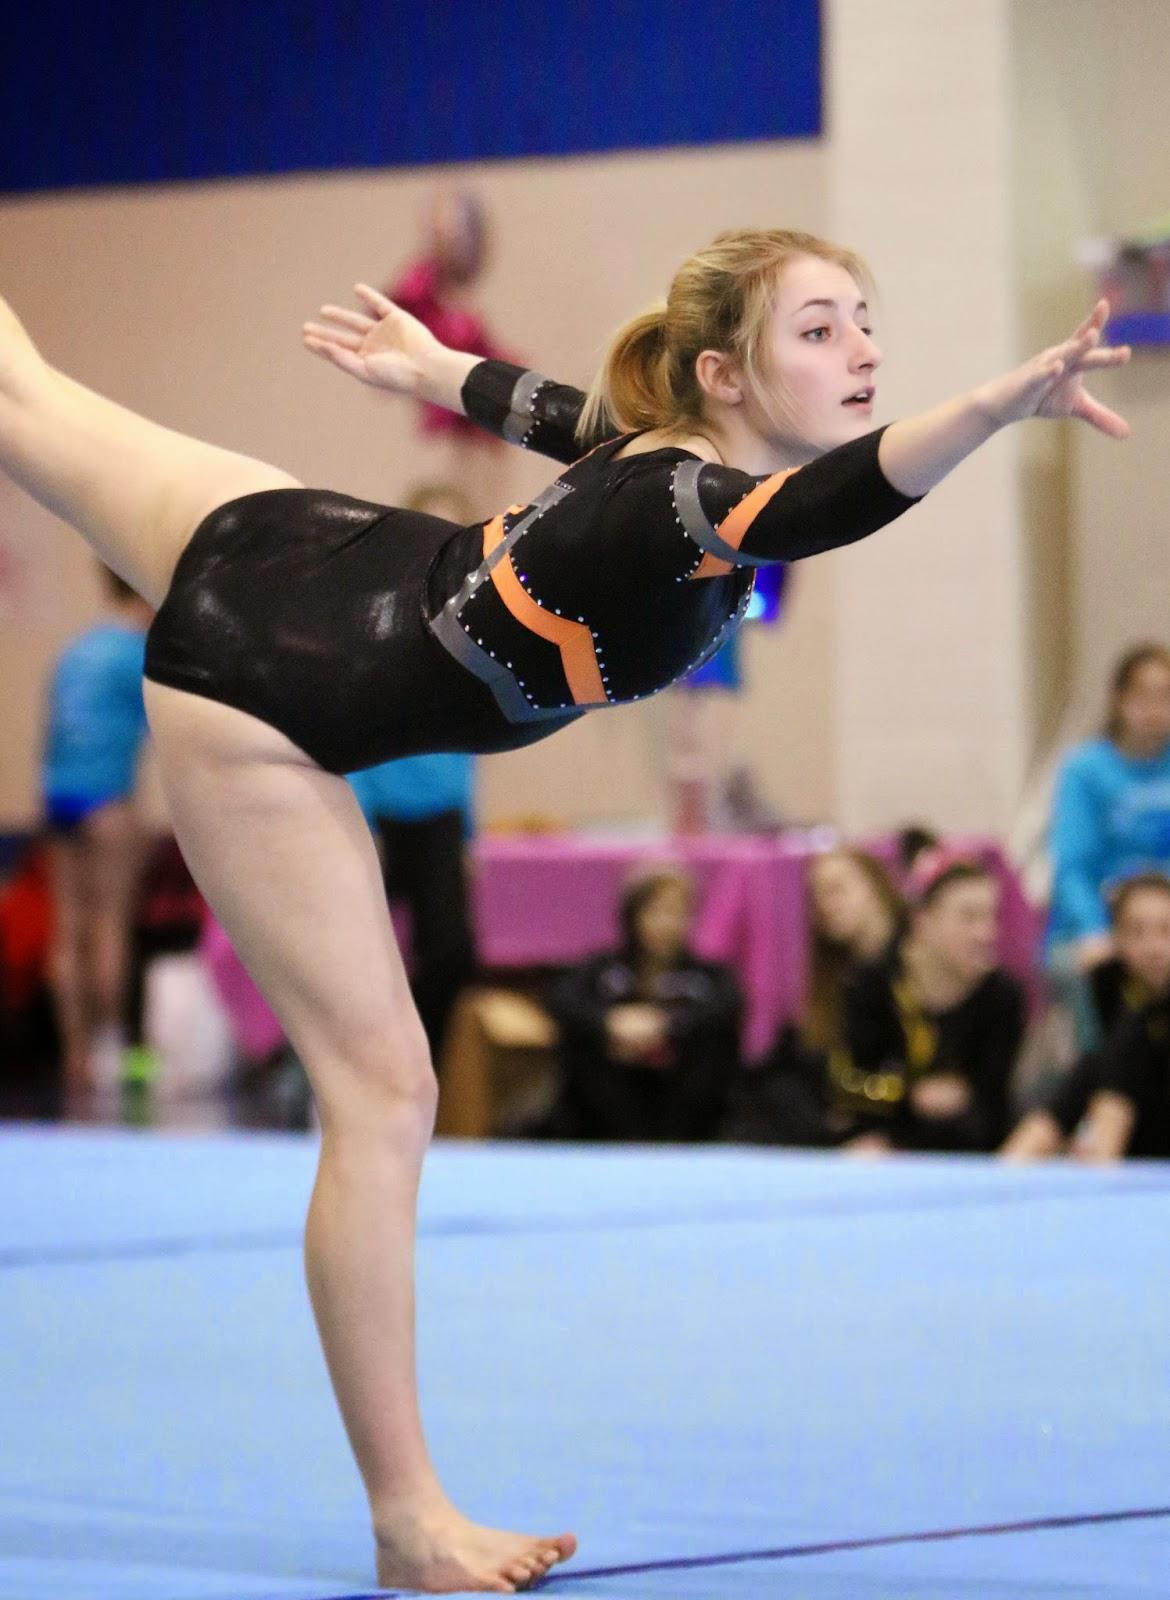 everyday gymnastics state meet indiana